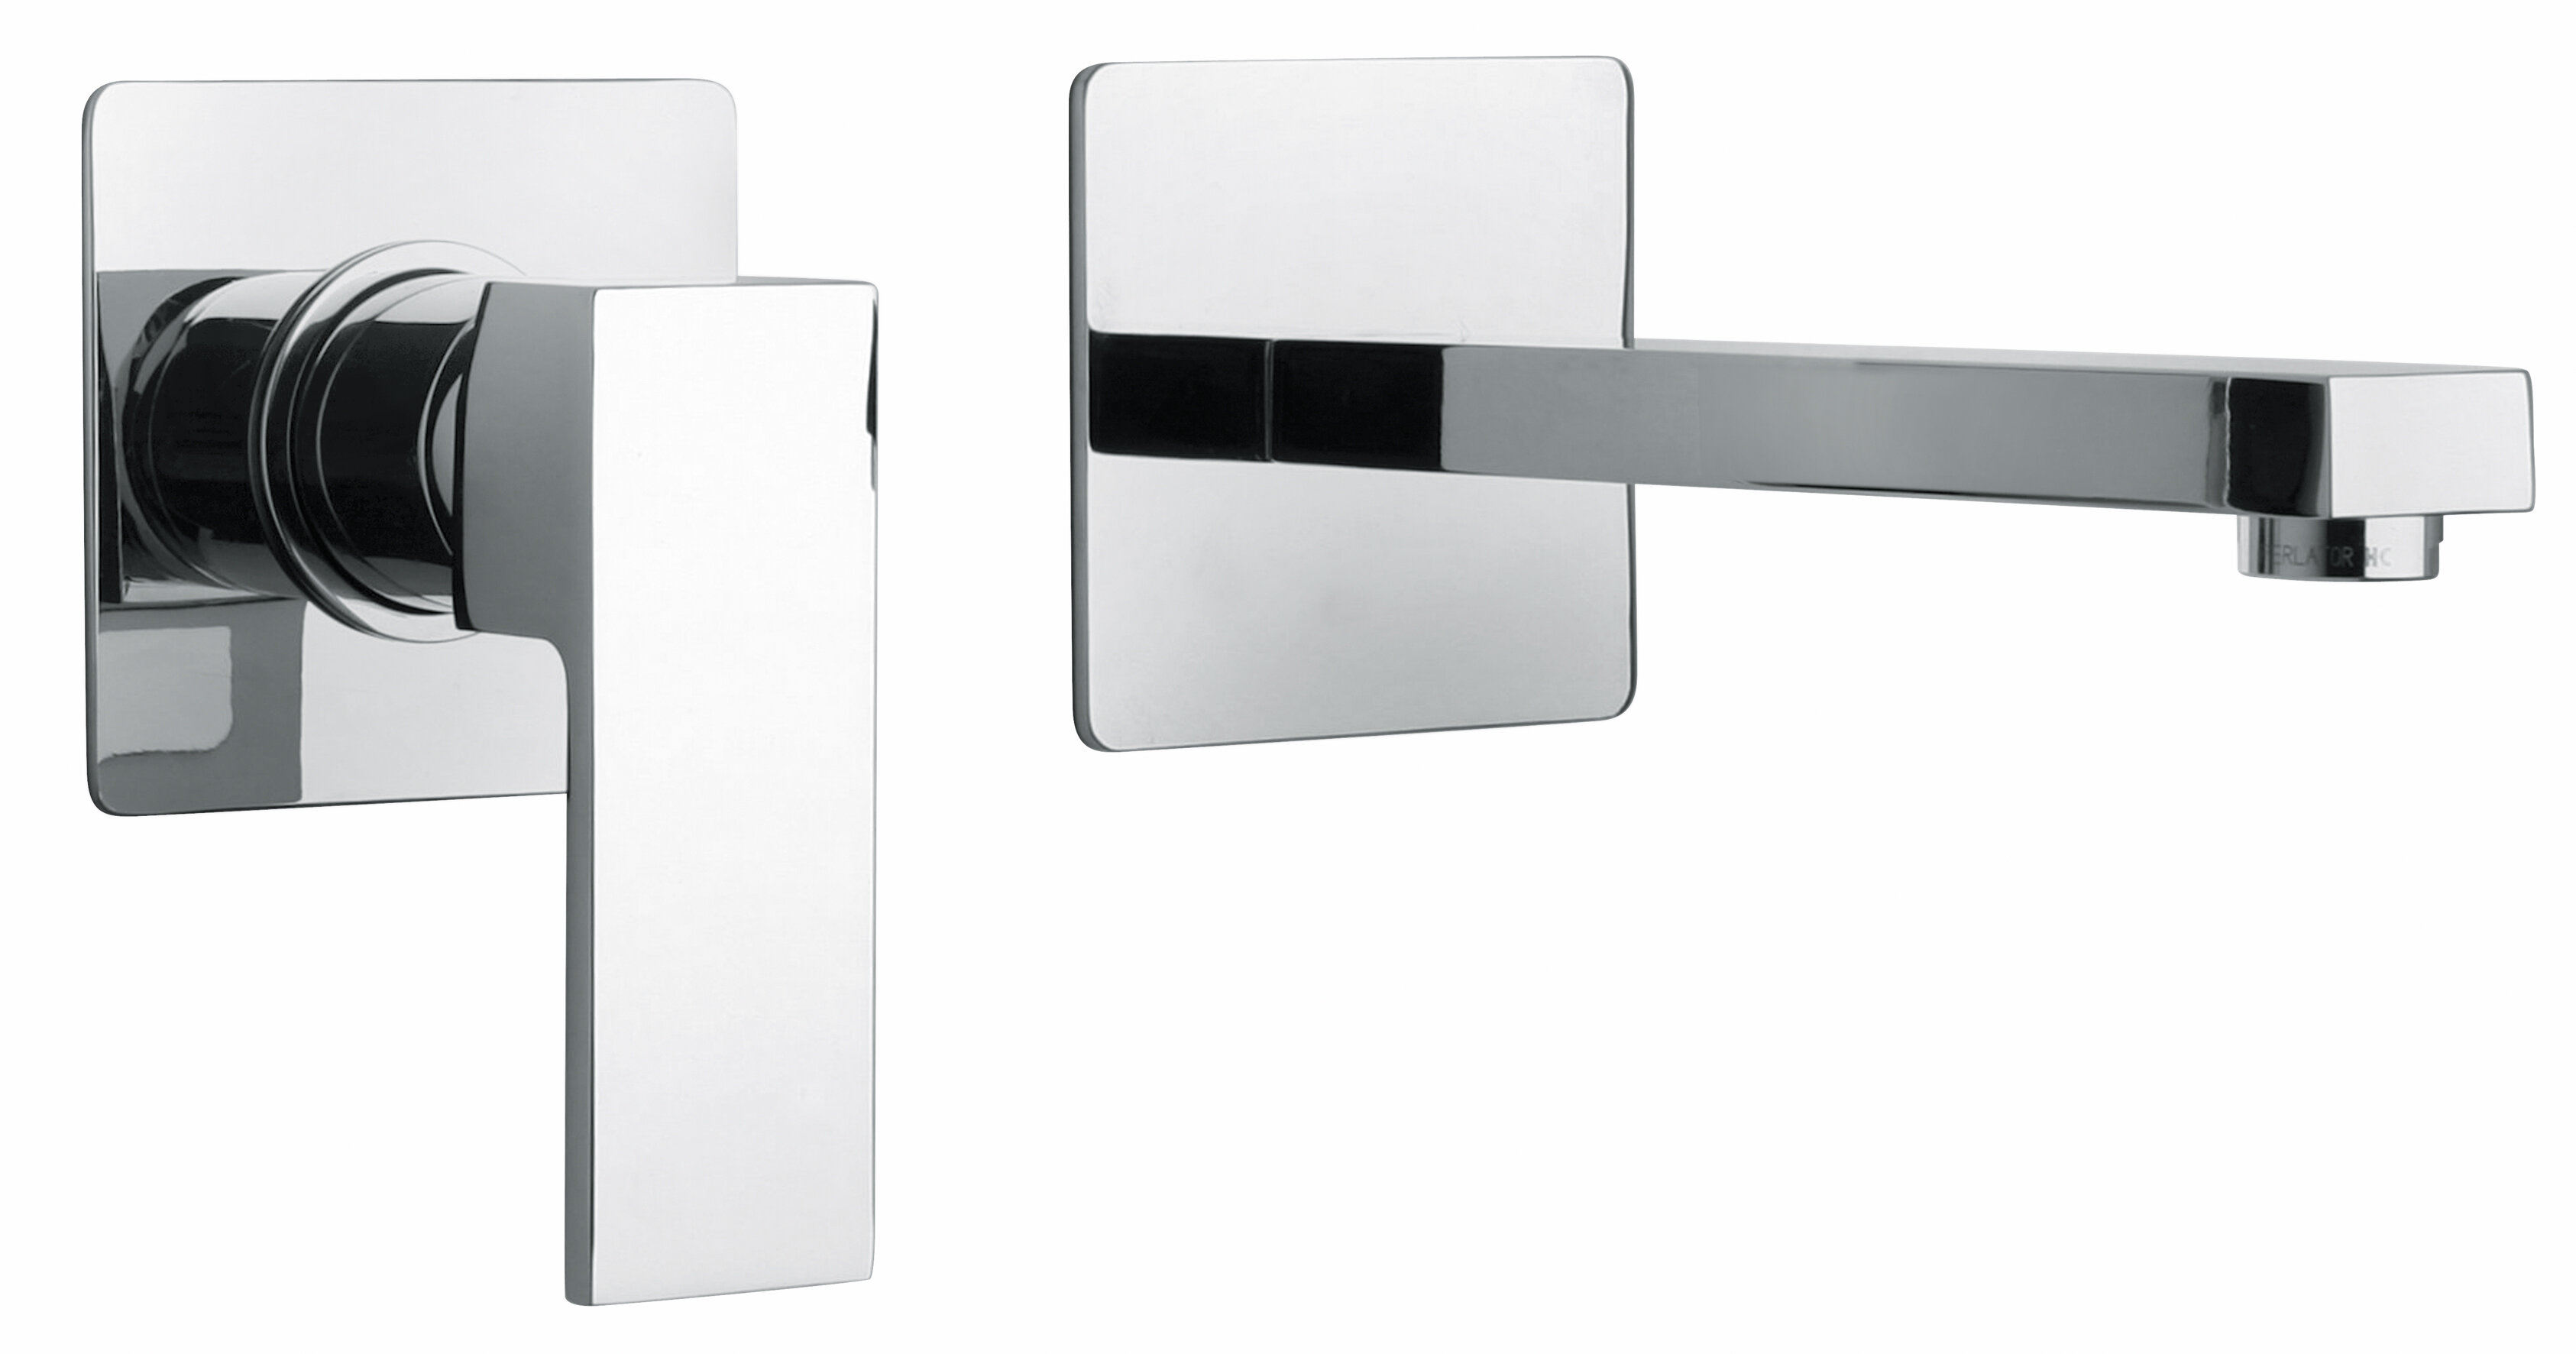 Jewel Faucets J12 Bath Series Wall mounted Bathroom Faucet & Reviews ...